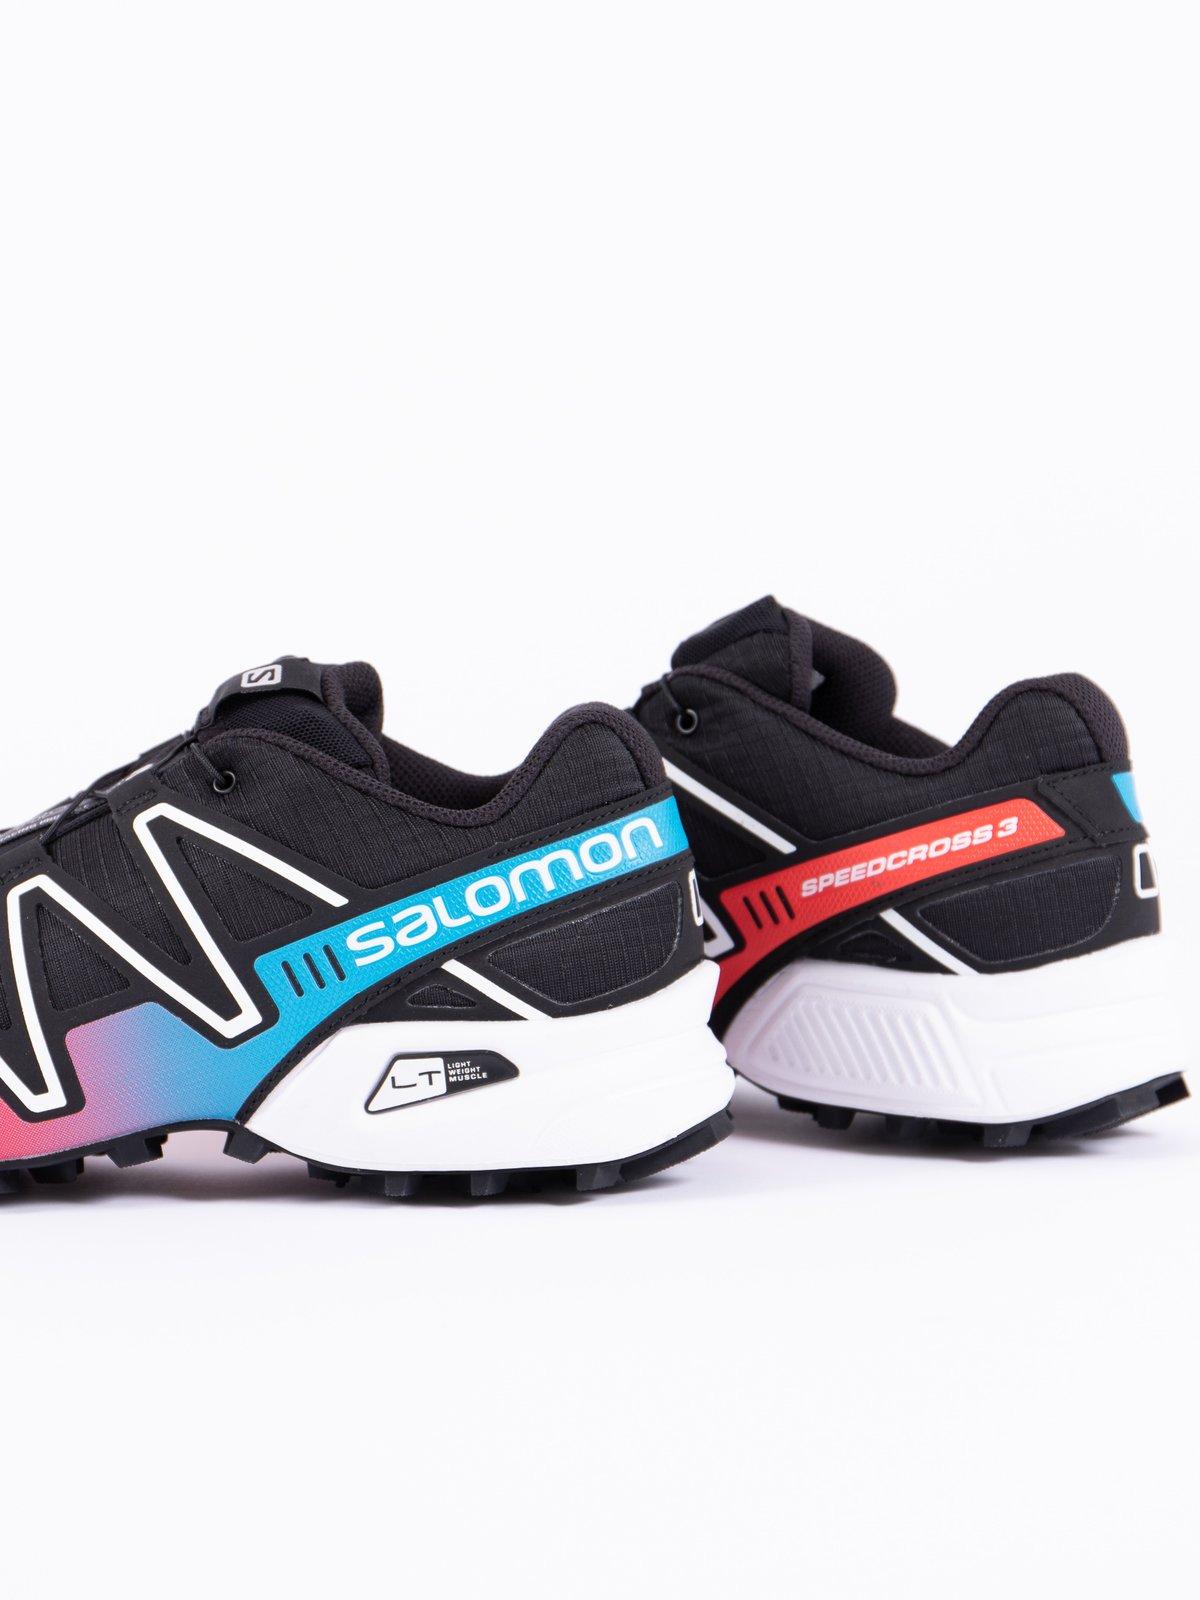 Black/Red/Transcend Blue Speedcross 3 Adv - Image 4